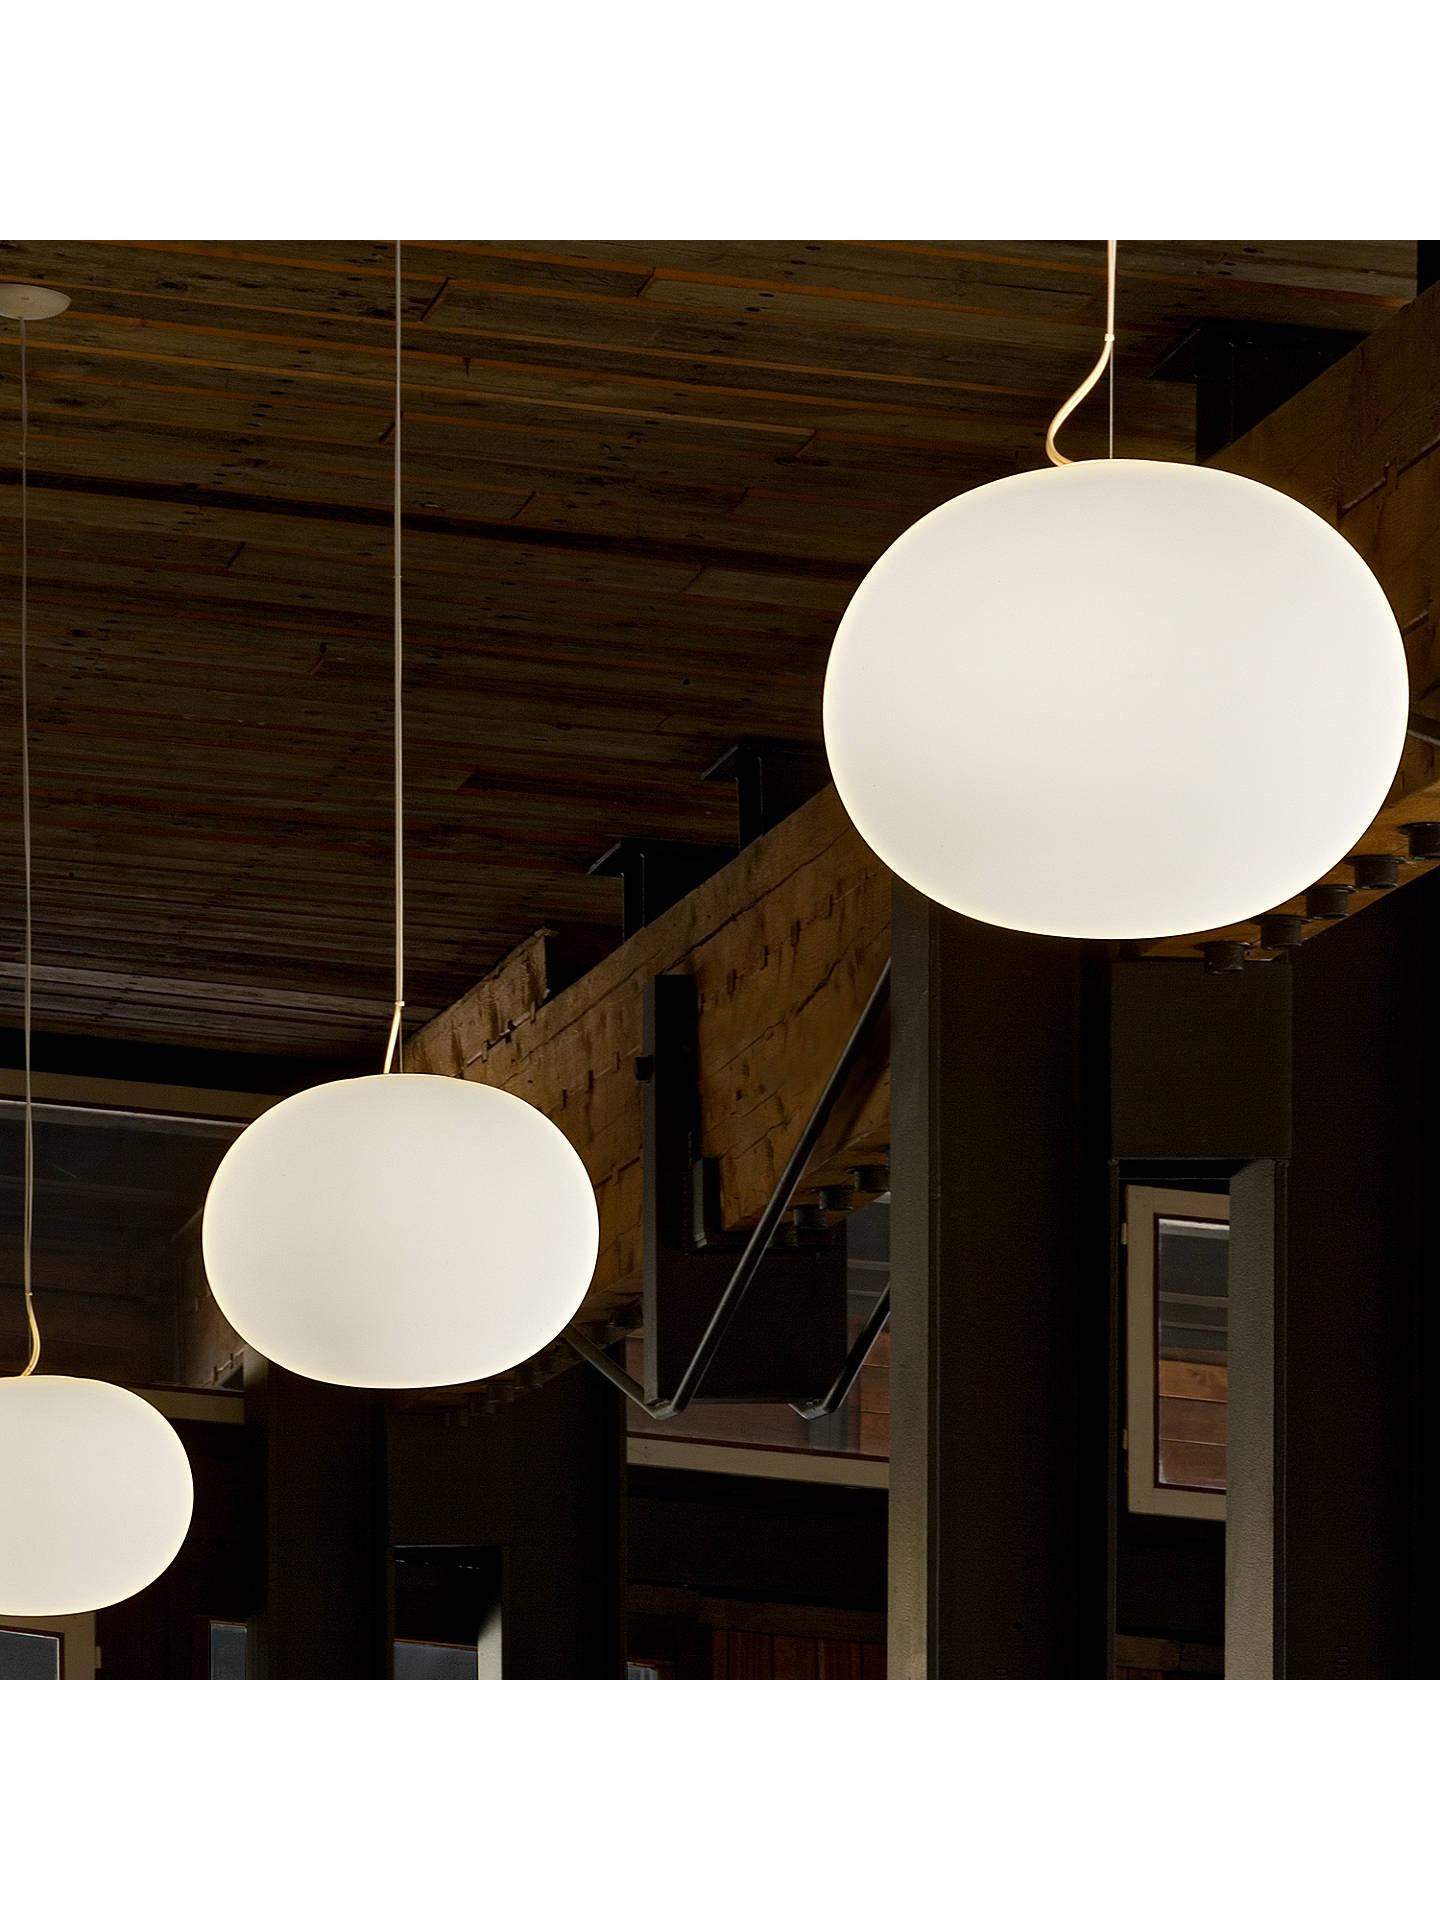 Flos Glo-Ball S1 Ceiling Light